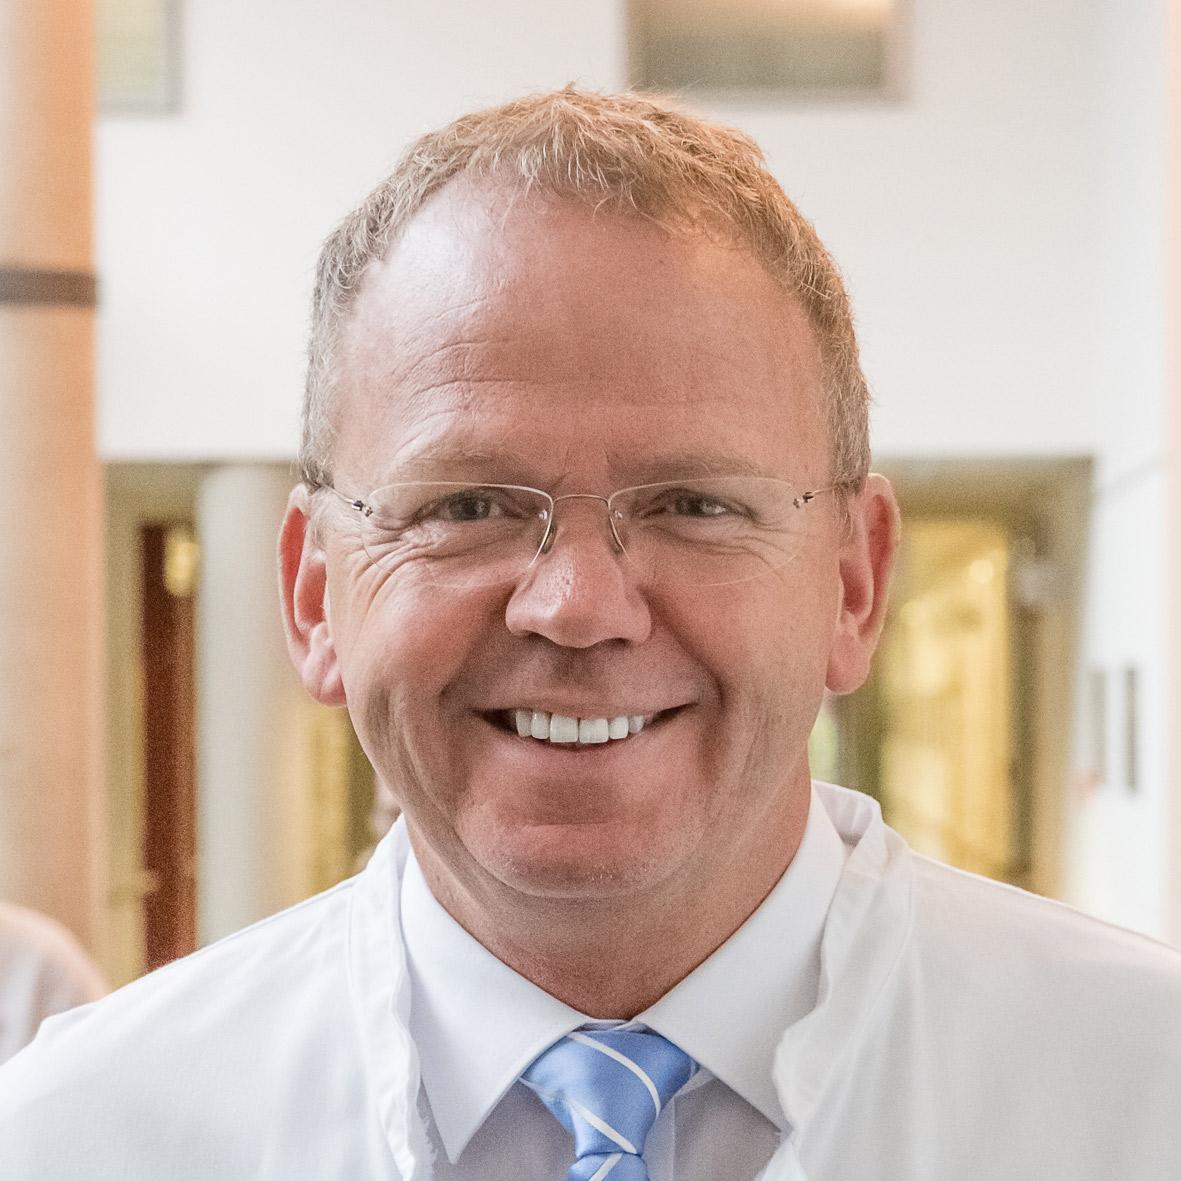 Porträt: Dr. Marcus Wiemer, Uniklinikum Johannes Wessling